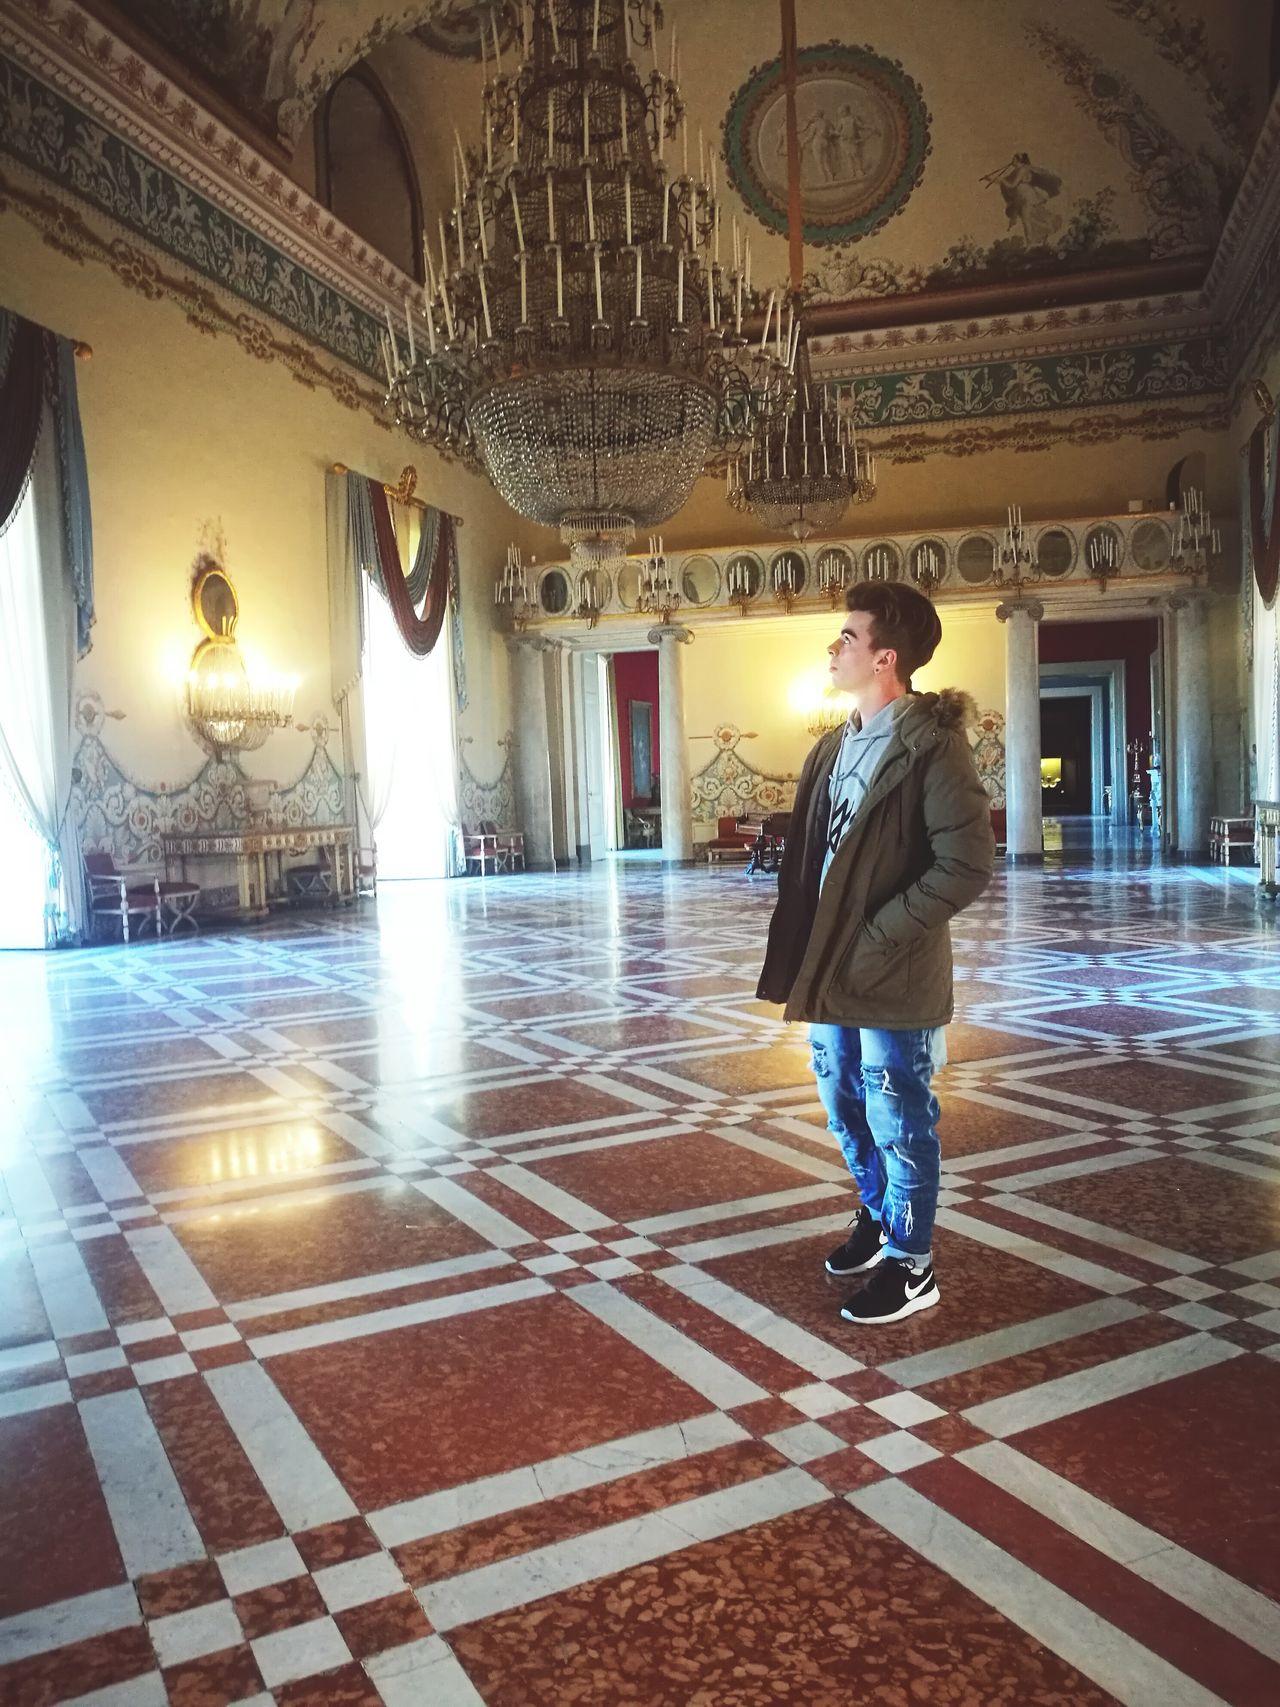 Museo di Capodimonte - Italy DanceRoom Baroque Capodimonte Museum Naples History Beauty Art Morning Architecture